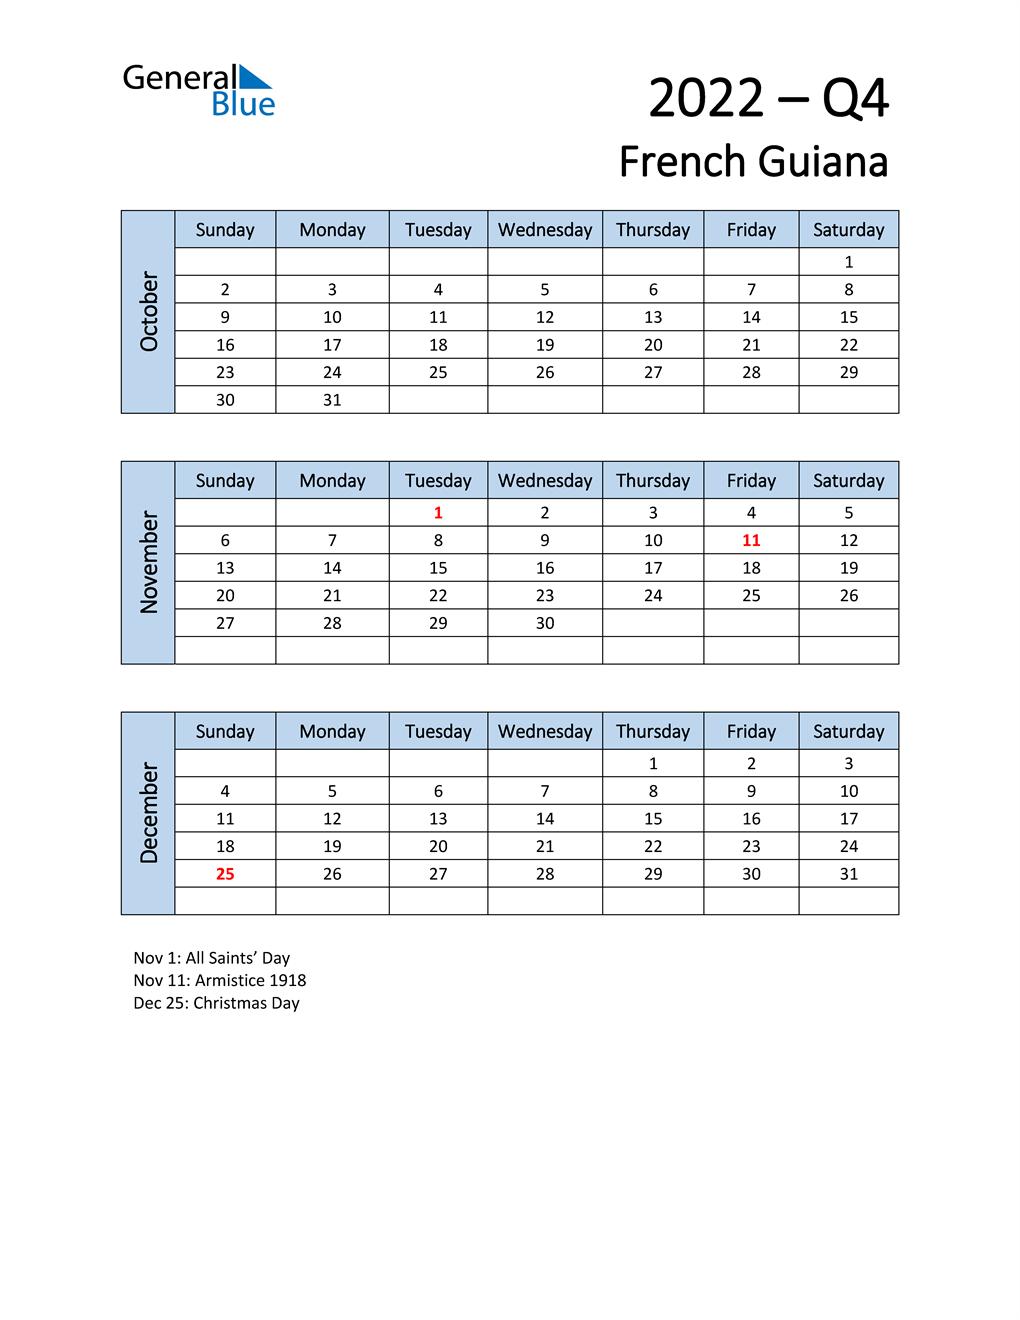 Free Q4 2022 Calendar for French Guiana